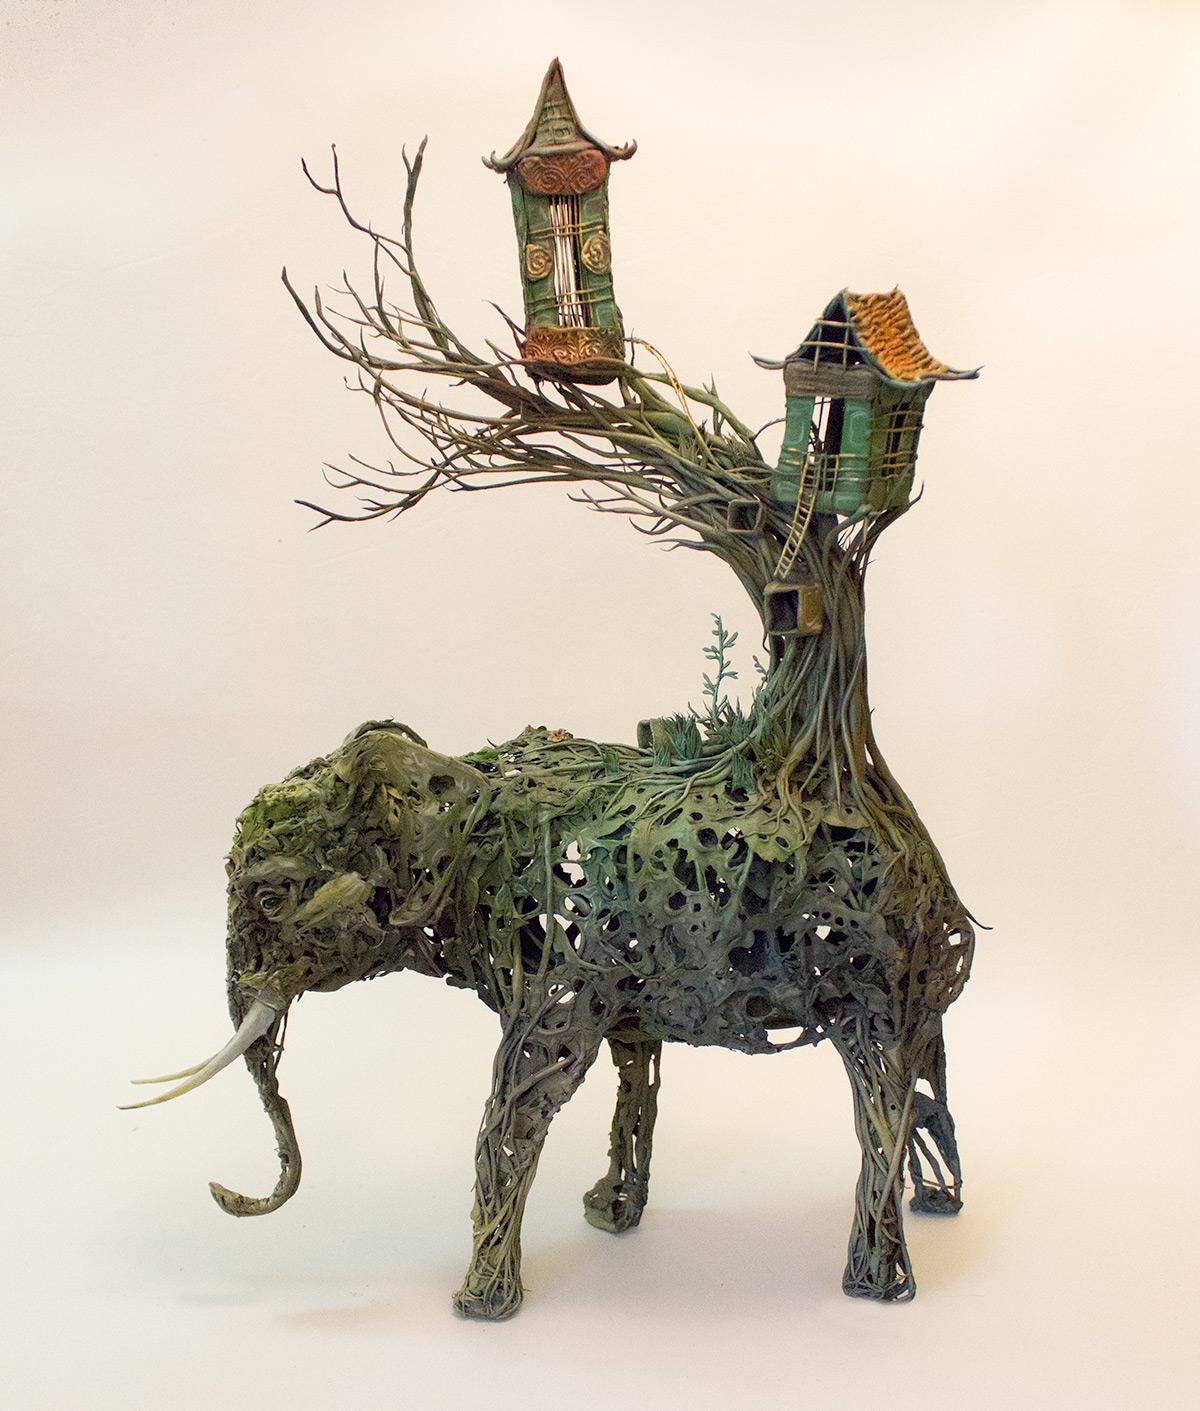 elefante-casa-sculture-surrealiste-ellen-jewett